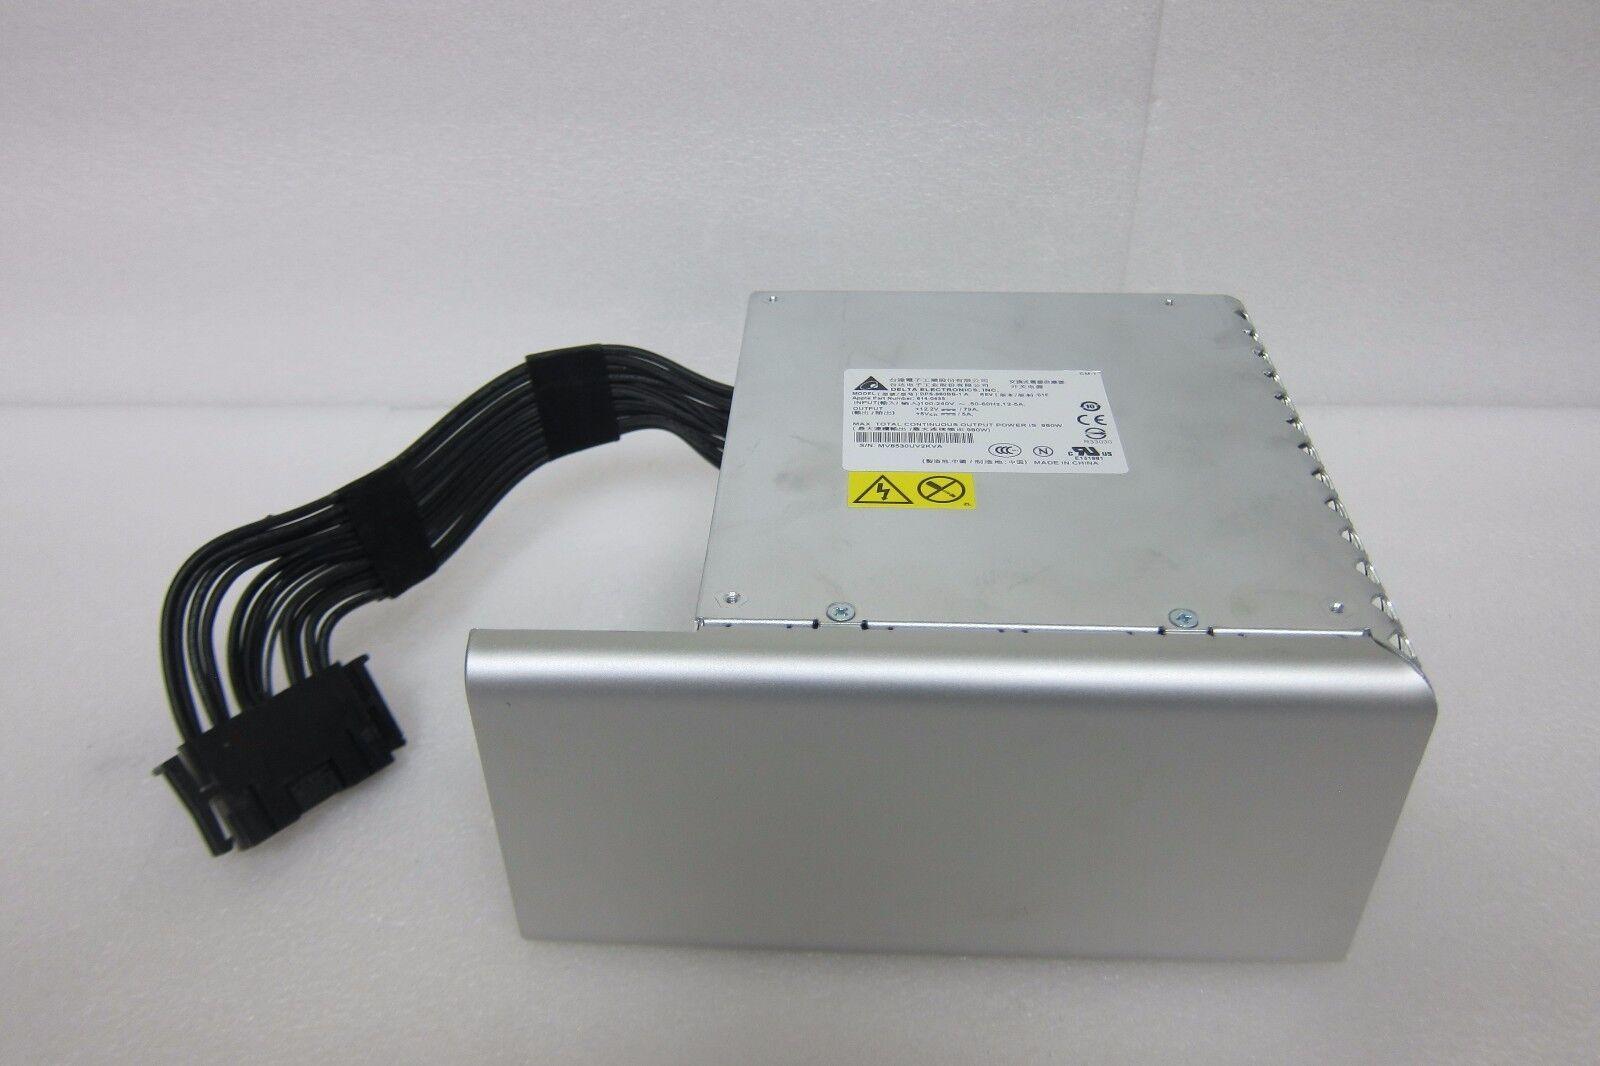 Genuine 2009 2010 2012 A1289 Mac Pro Power Supply 614-0435 614-0454